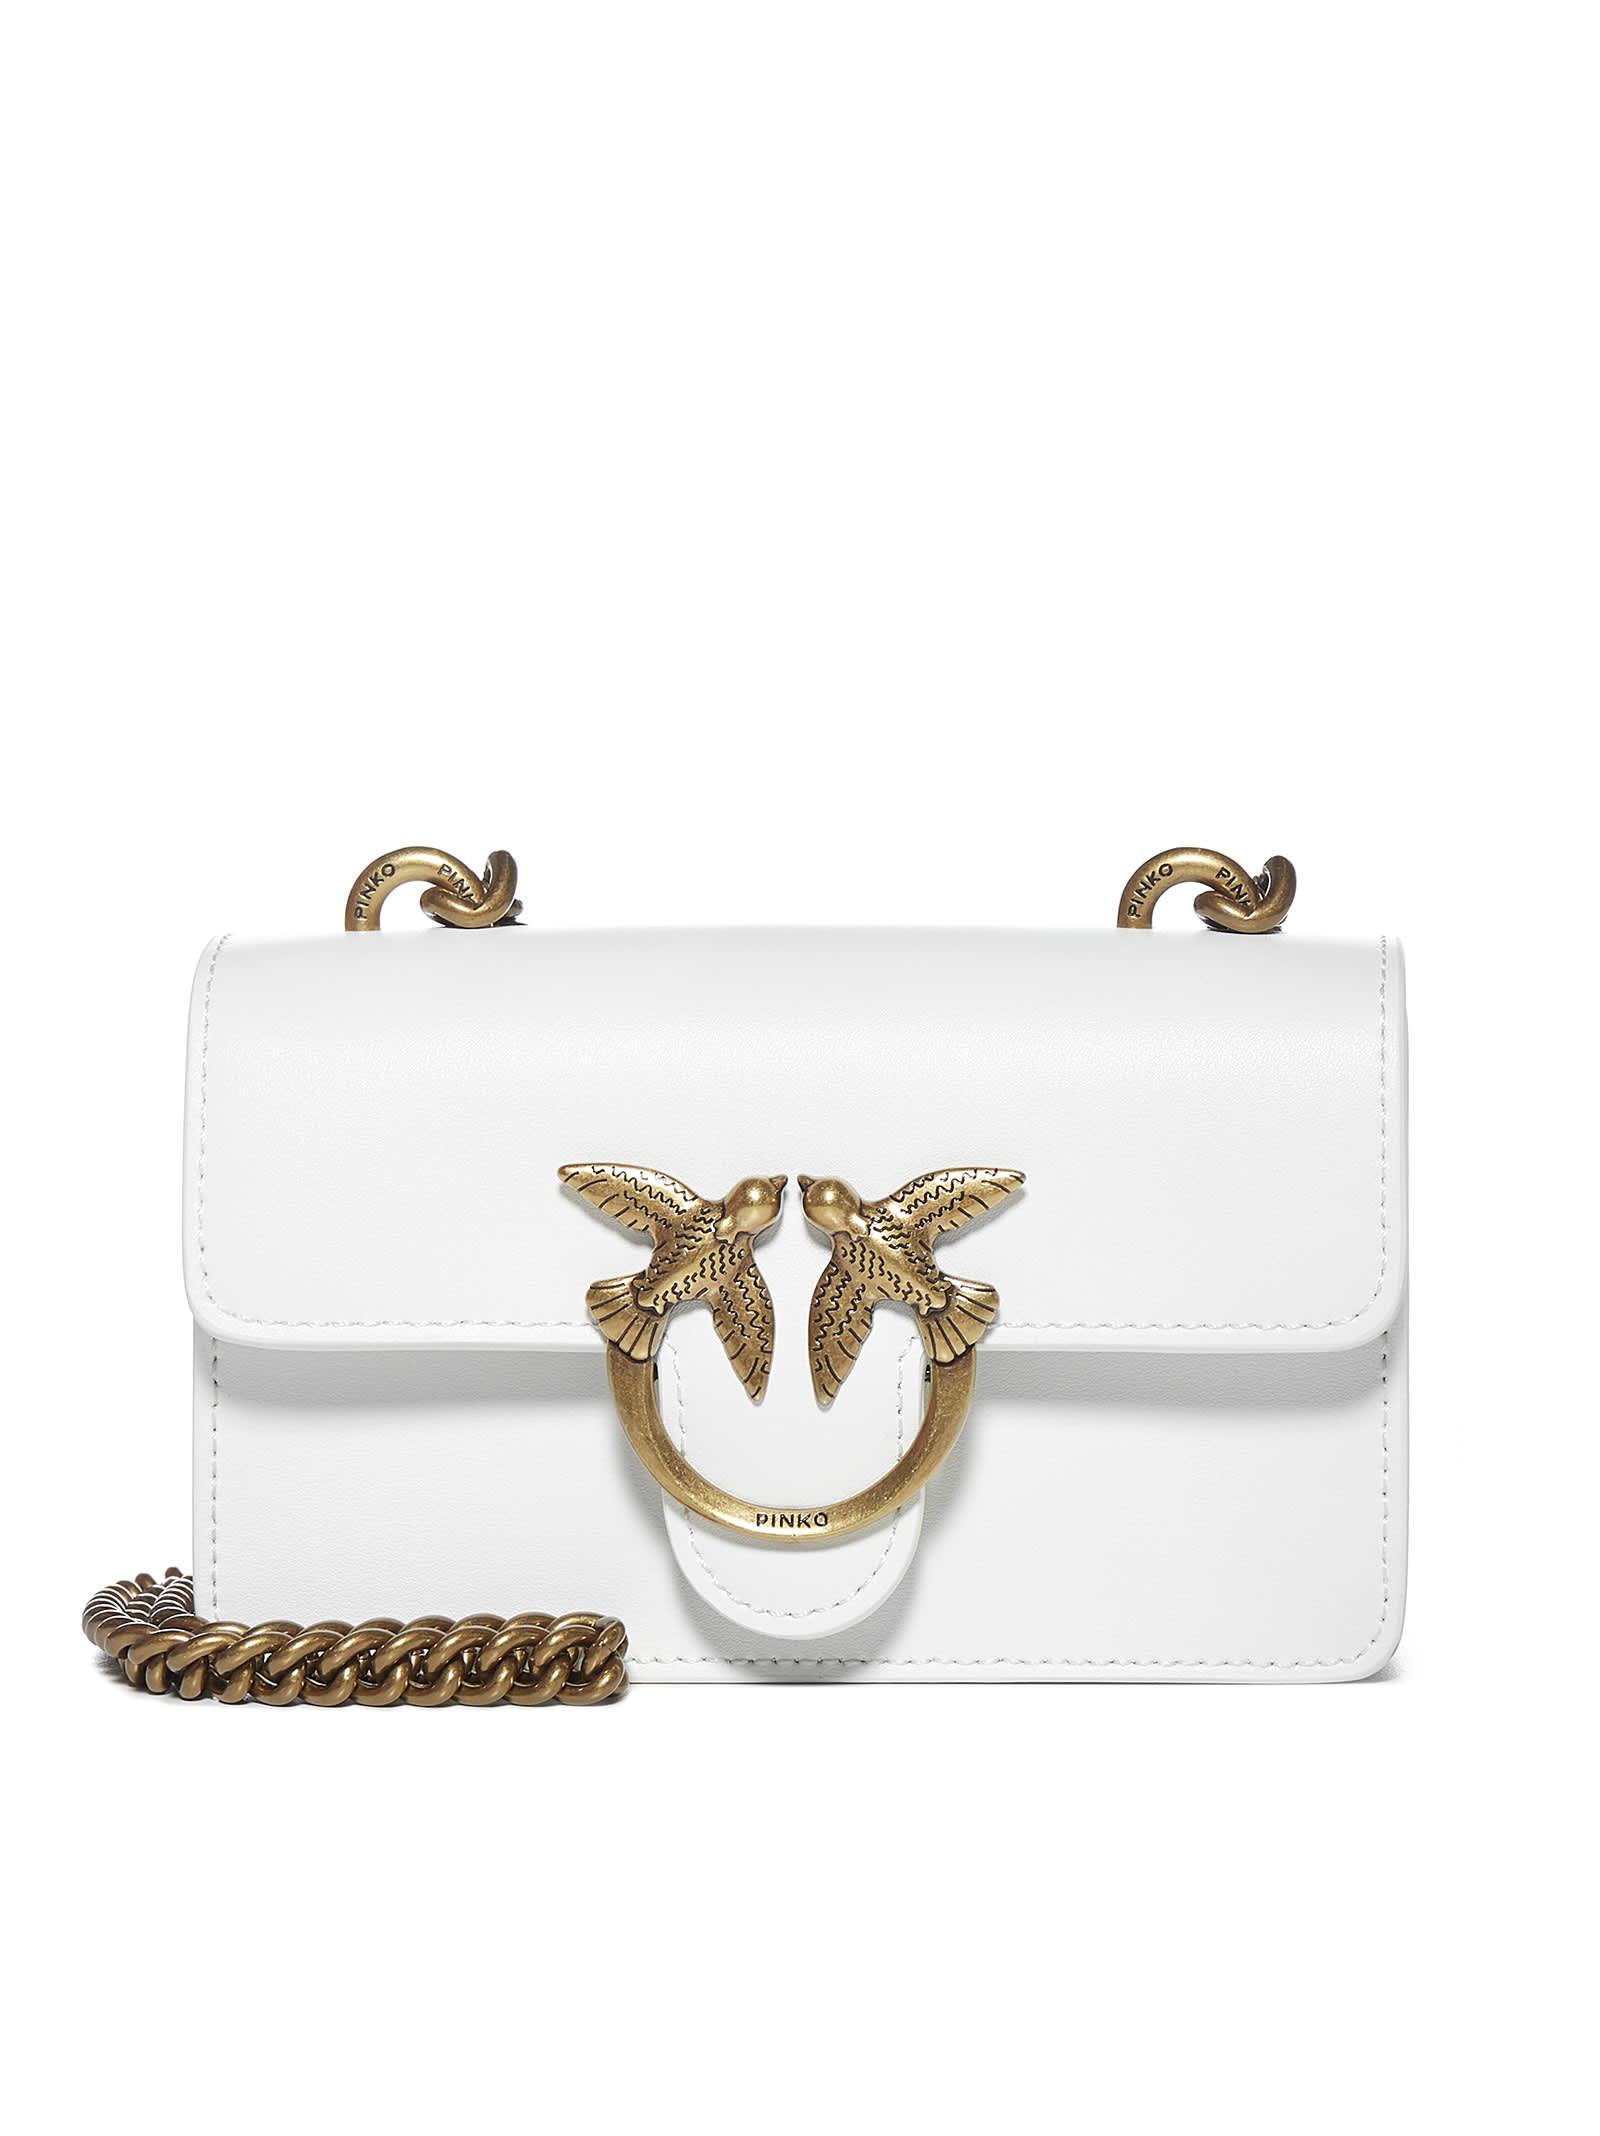 Pinko Shoulder Bag In White